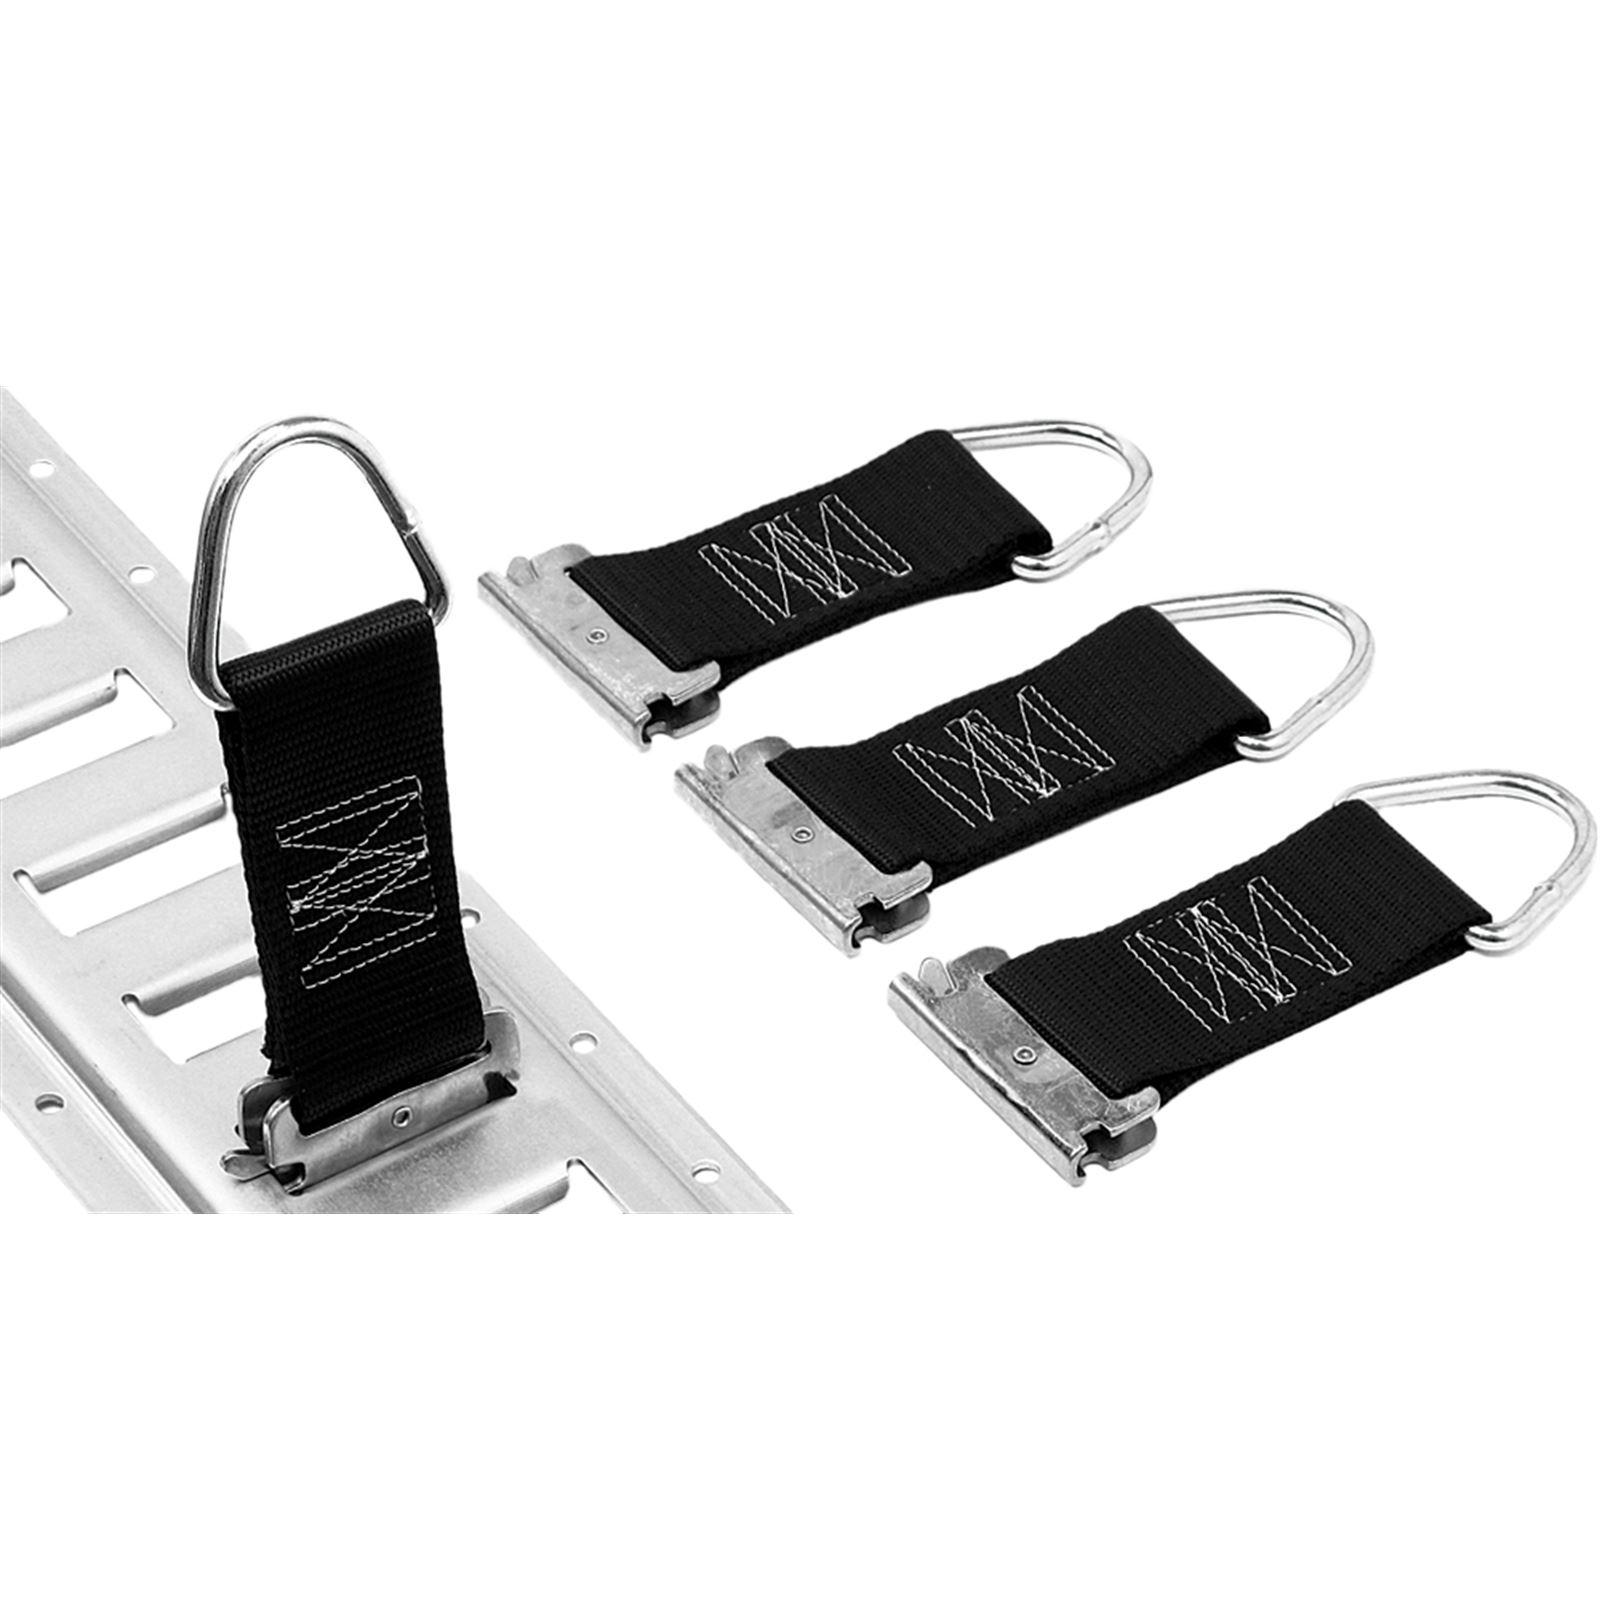 Powertye E-Track Clips w/D-Ring